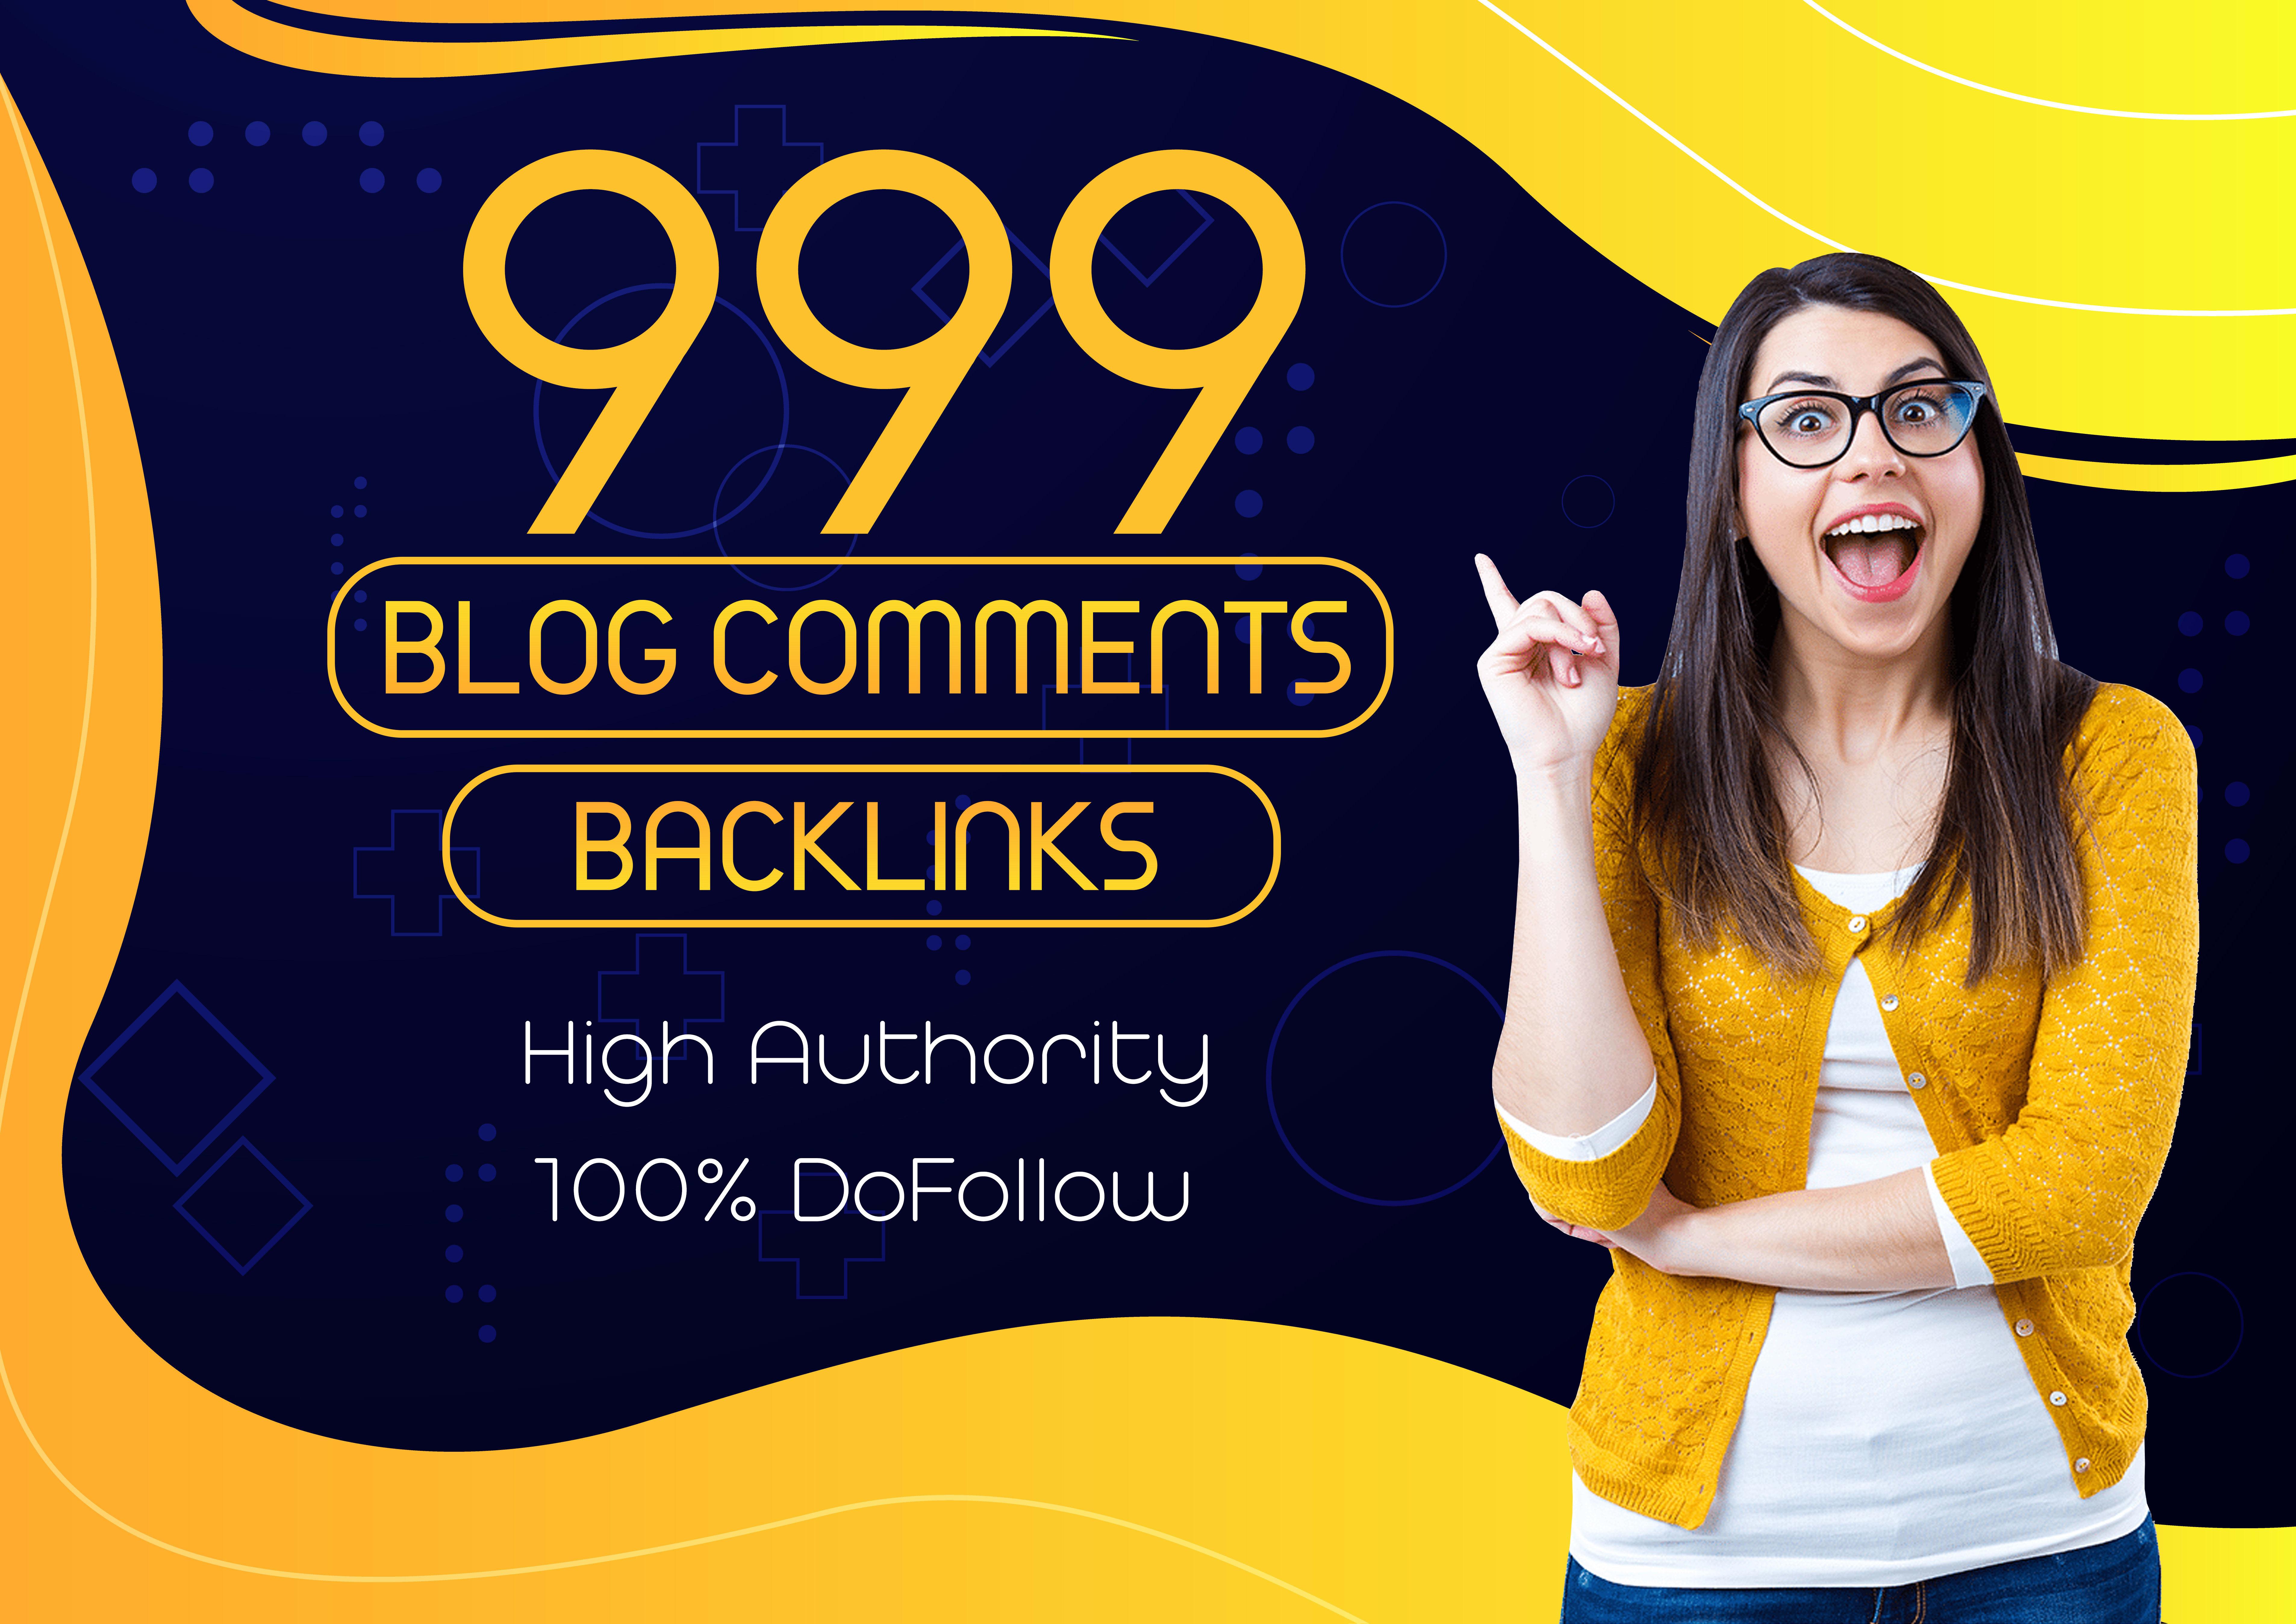 Manually Create 999 Dofollow Blog Comments SEO Backlinks